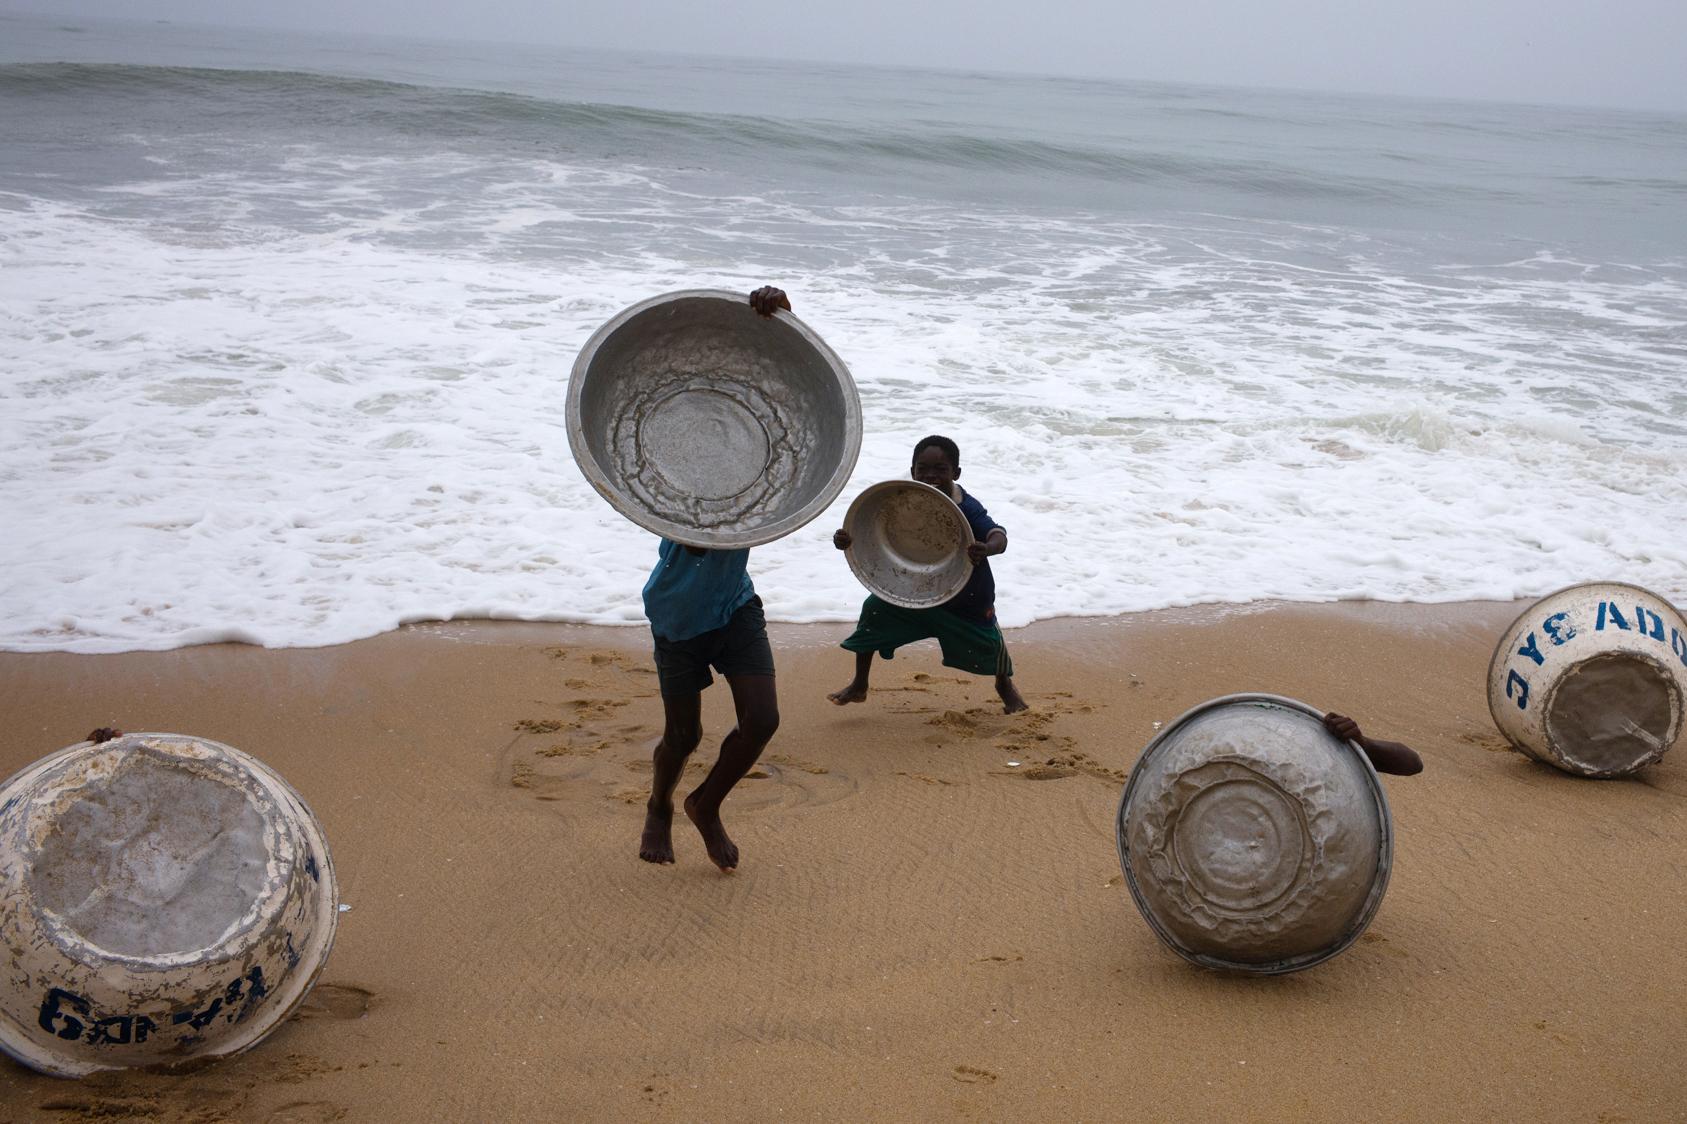 Ghana-day-cropped-3-28